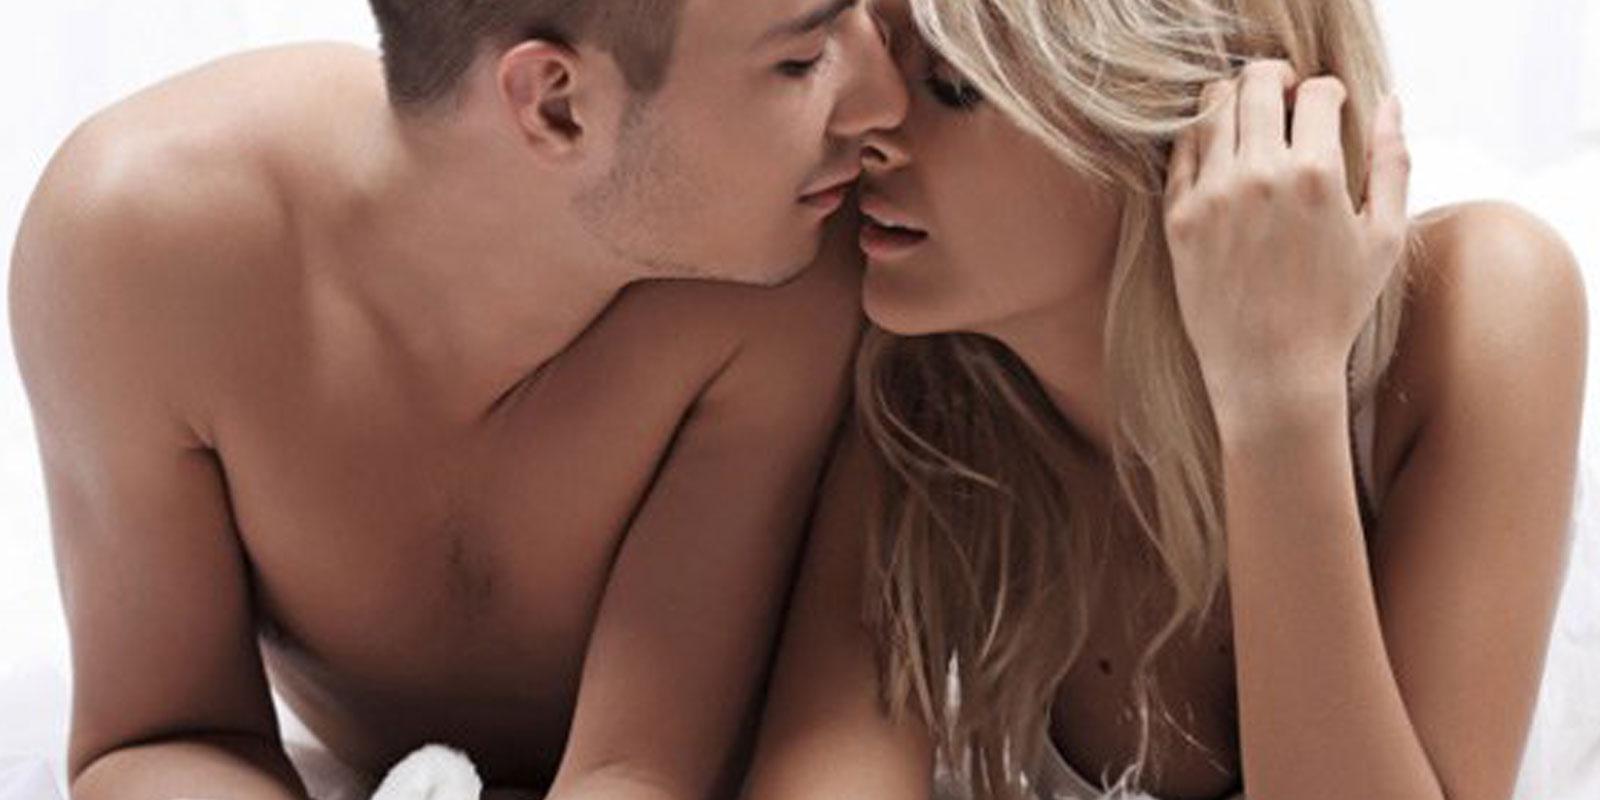 Blonde interracial gand video